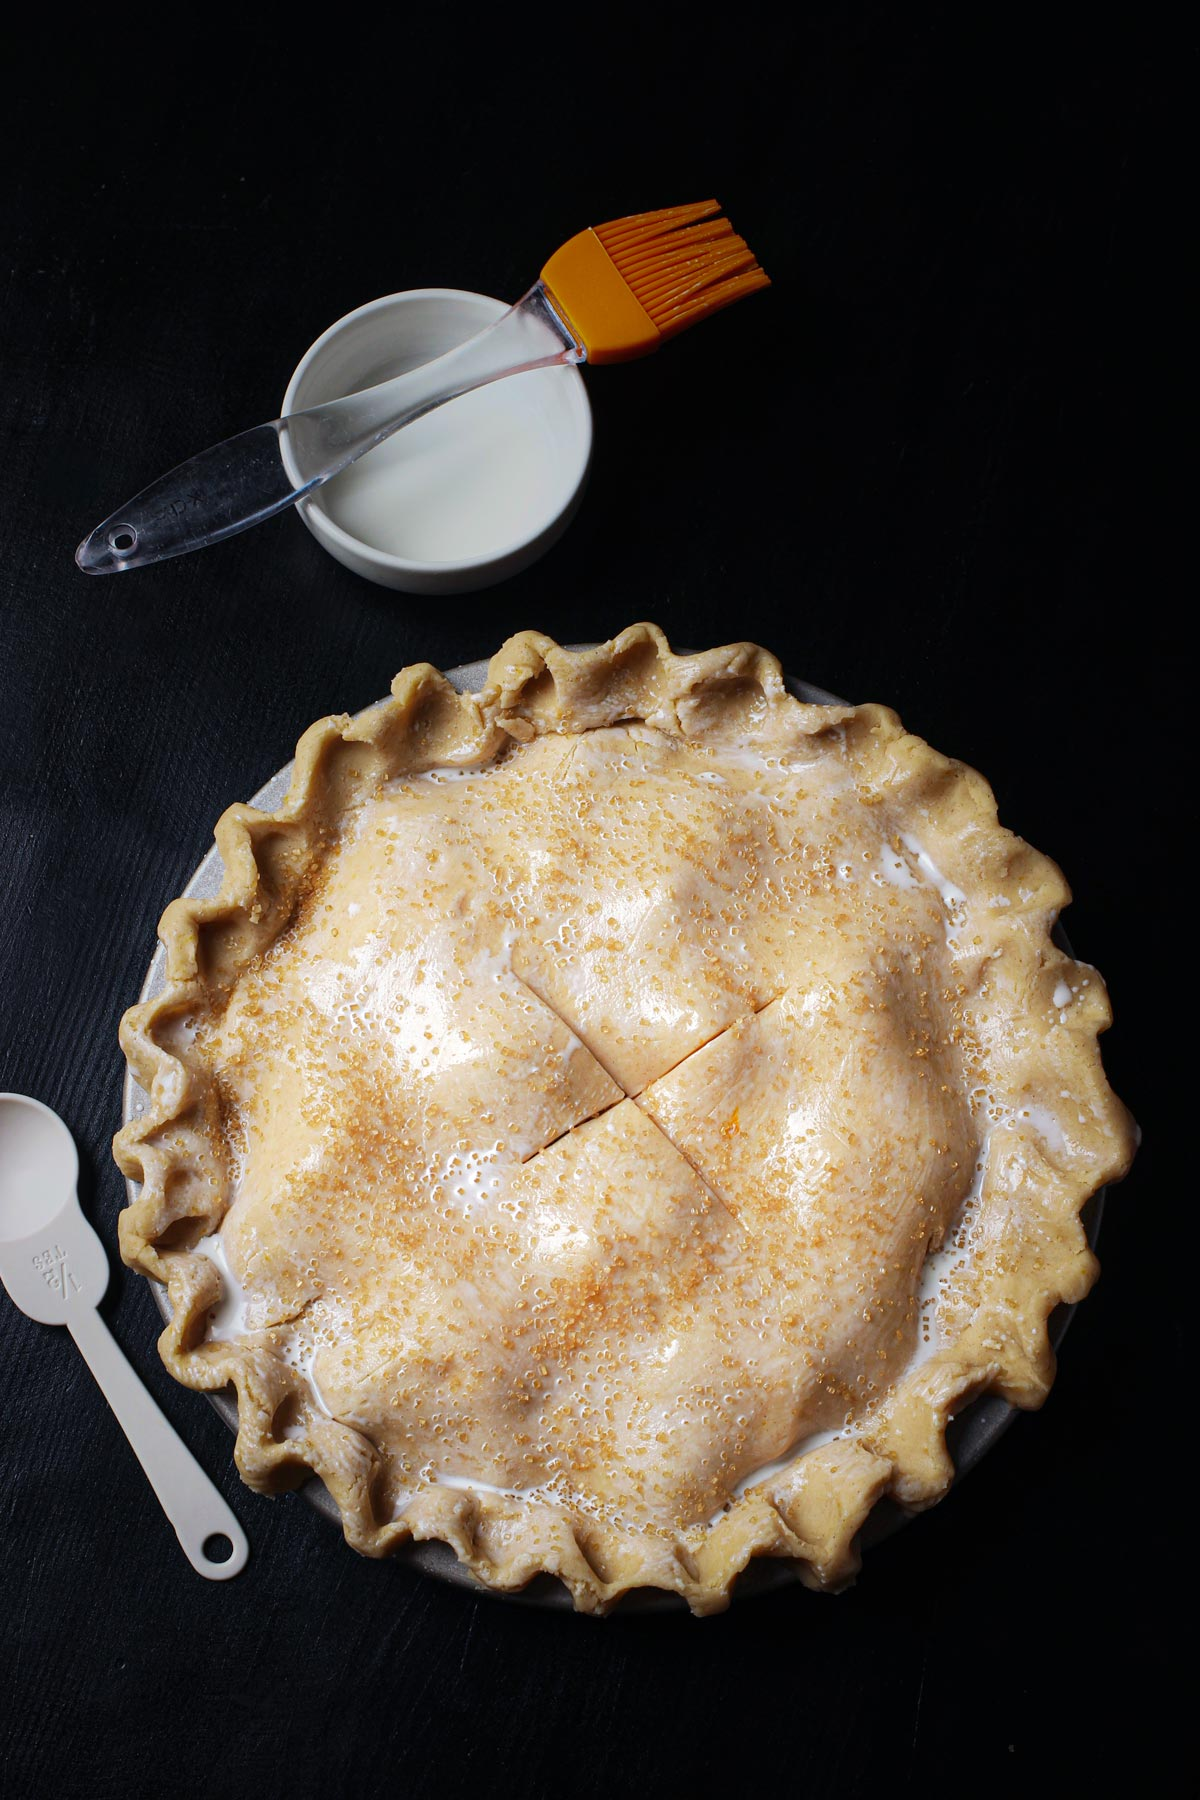 coarse sugar sprinkled over pie crust.